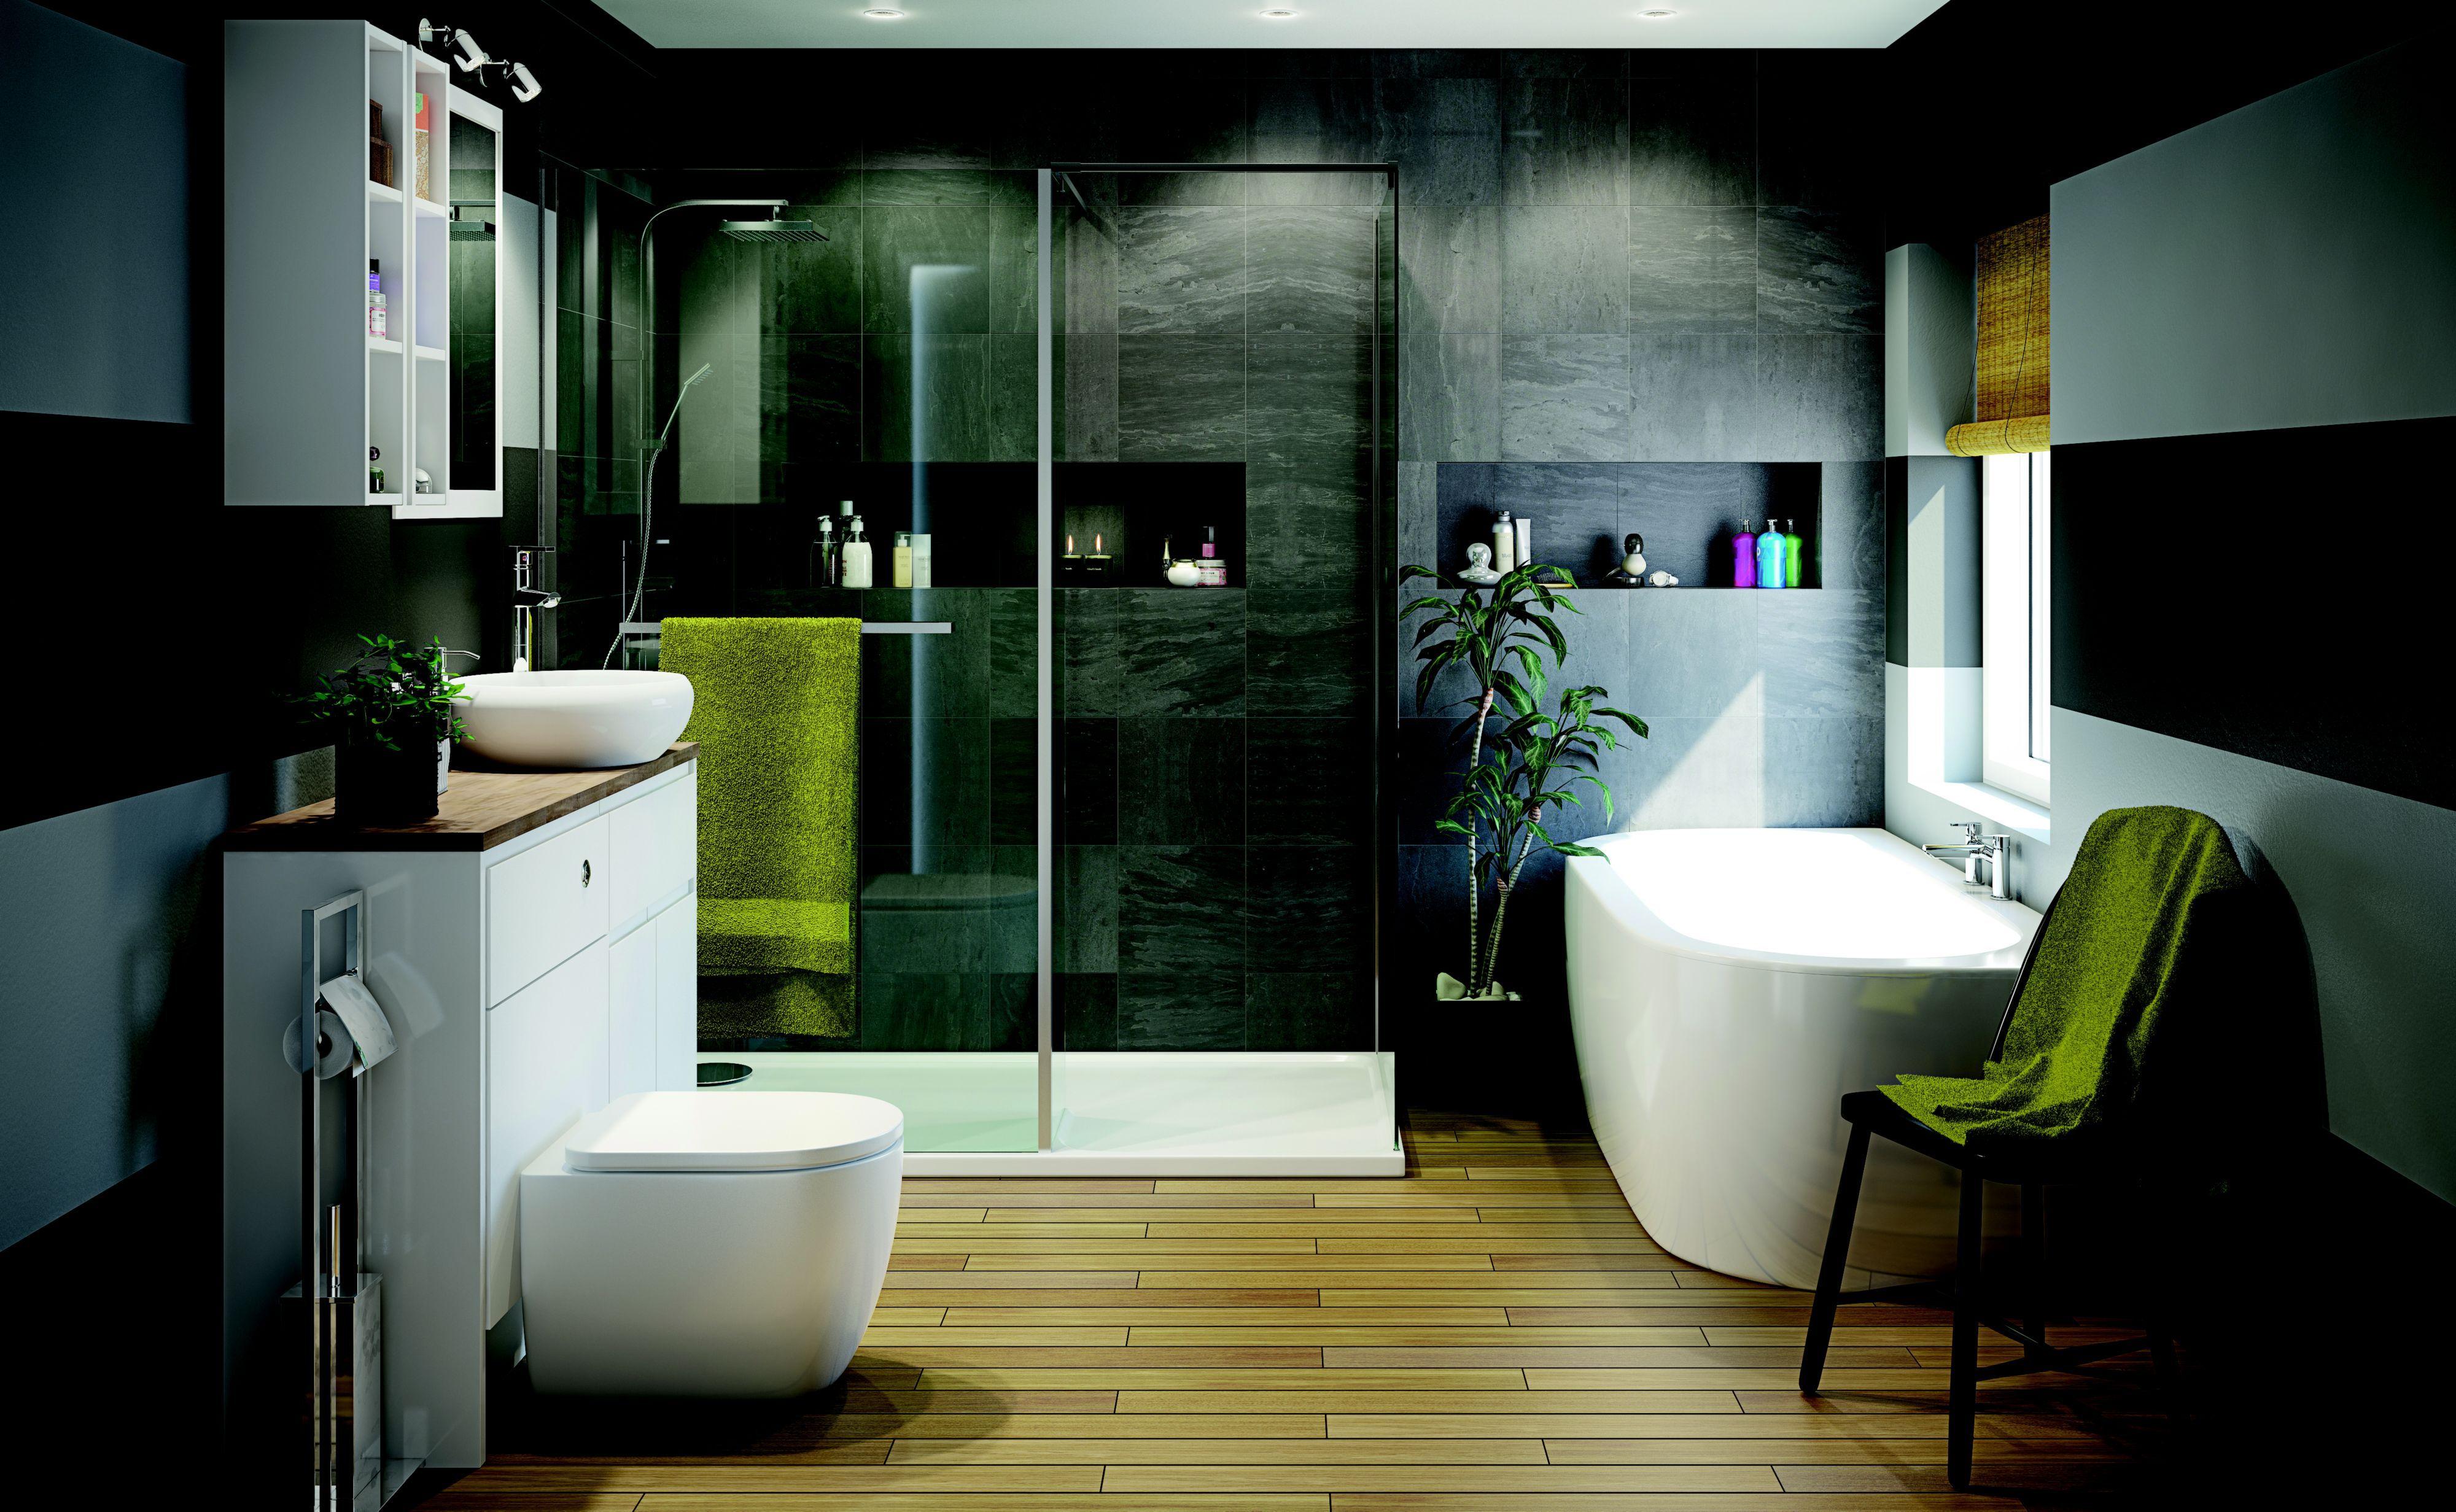 B And Q Bathroom Design Service In 2020 Modern Bathroom Design Freestanding Tub Shower Contemporary Bathroom Decor